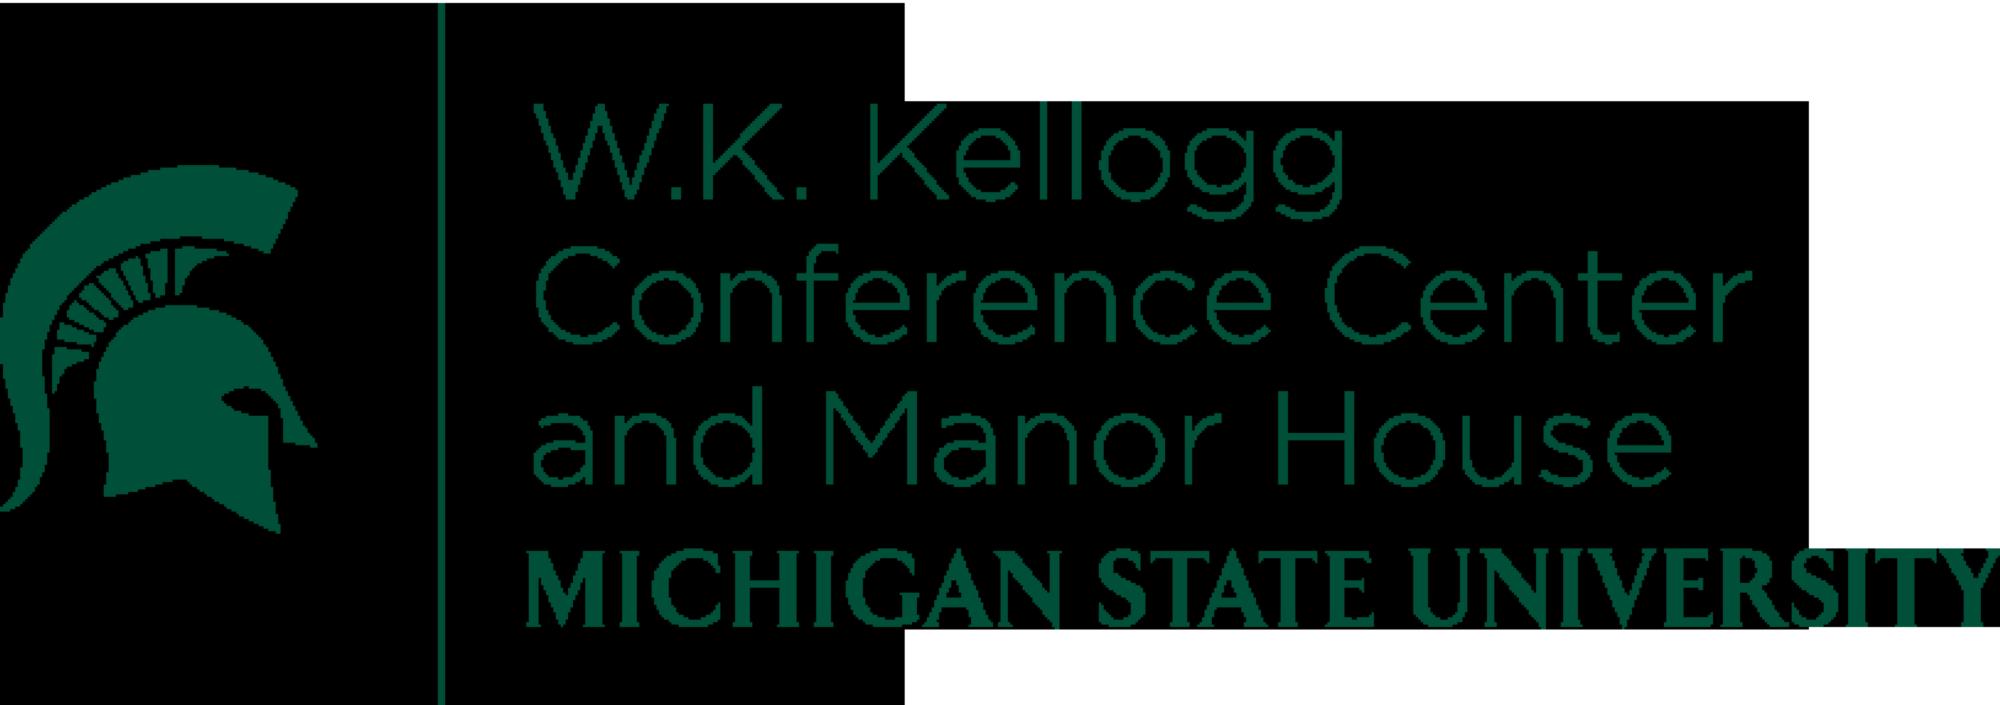 Michigan state university Kellogg biological station Banner.